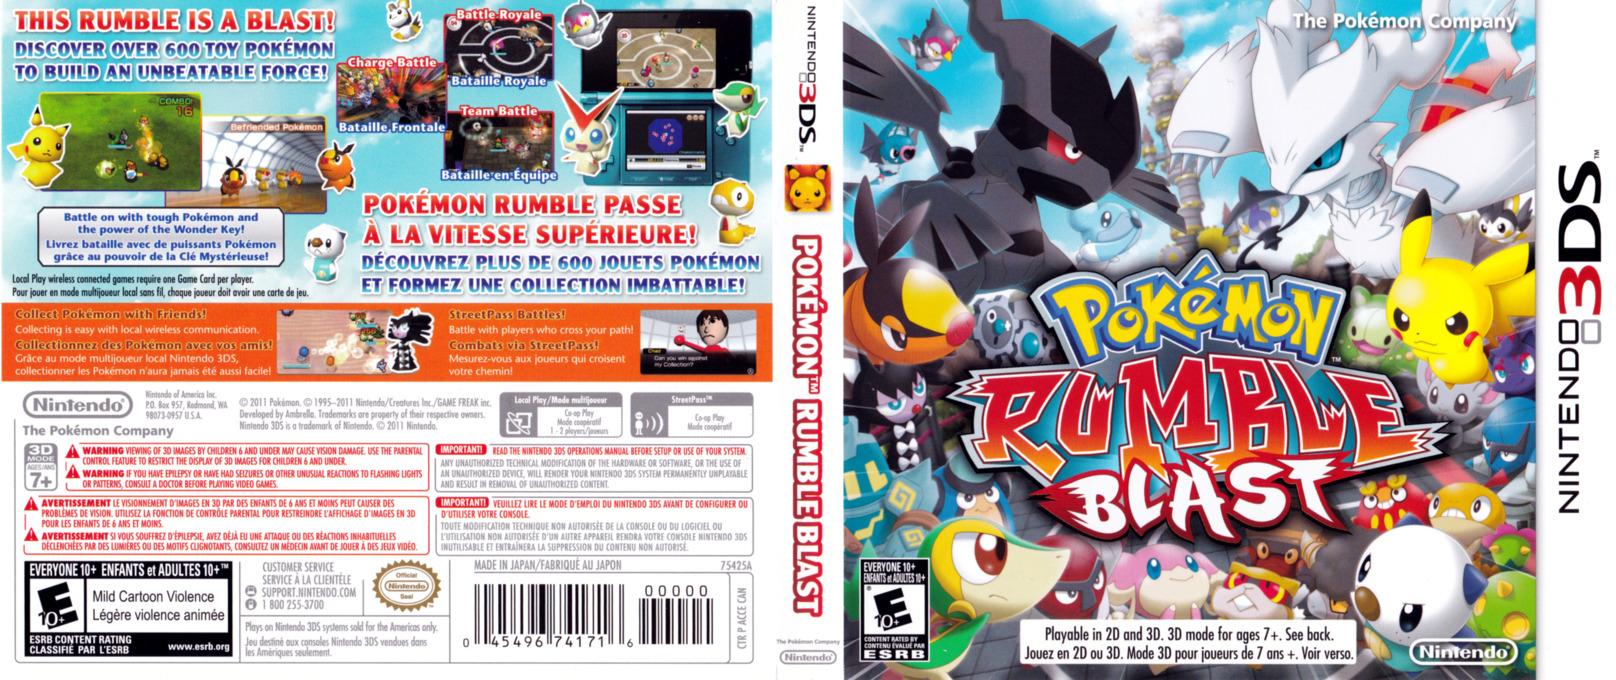 Pokémon Rumble Blast 3DS coverfullHQ (ACCE)